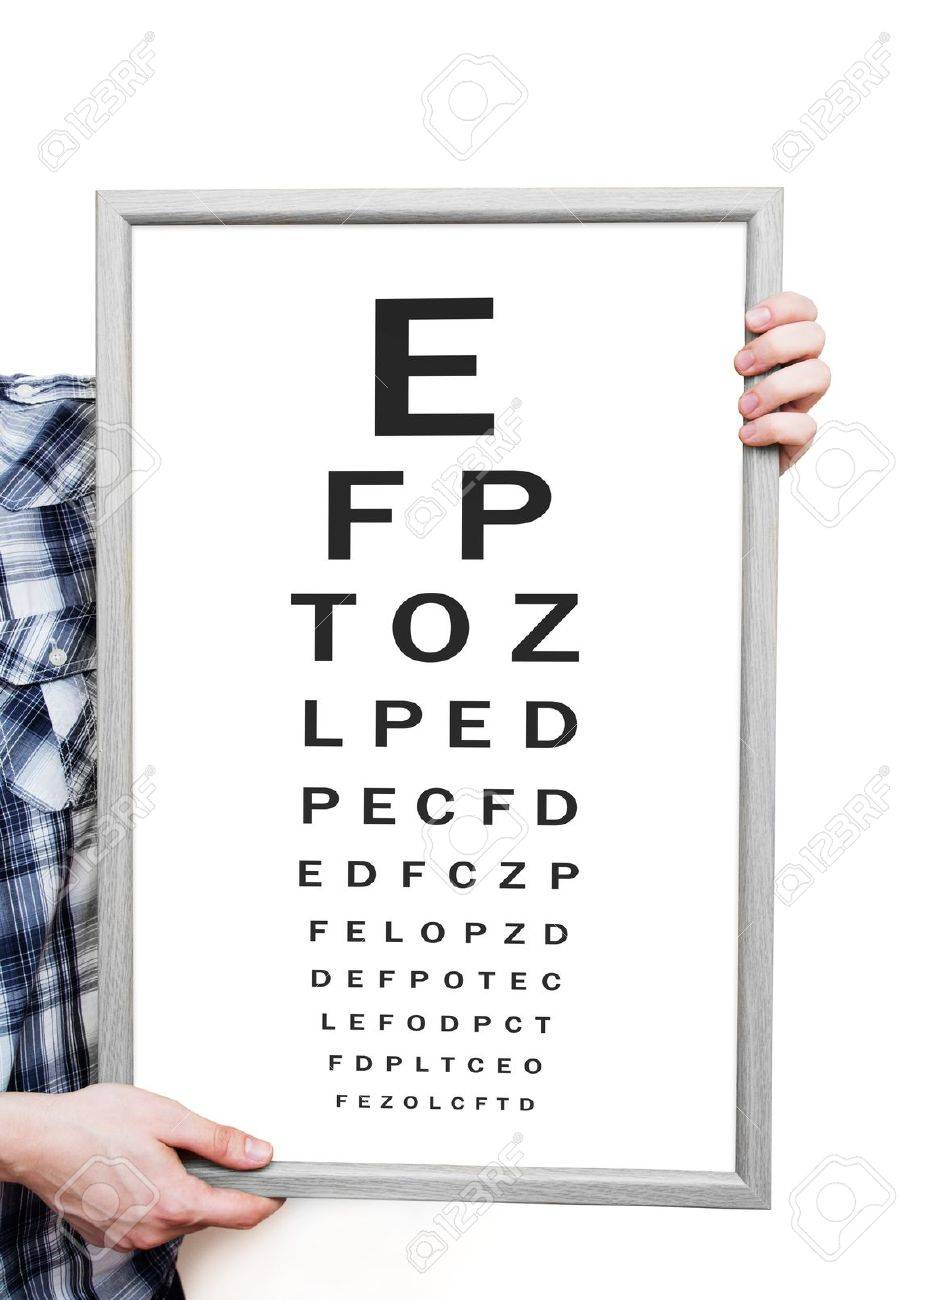 Man showing snellen eye exam chart on white background stock photo man showing snellen eye exam chart on white background stock photo 18724916 nvjuhfo Choice Image